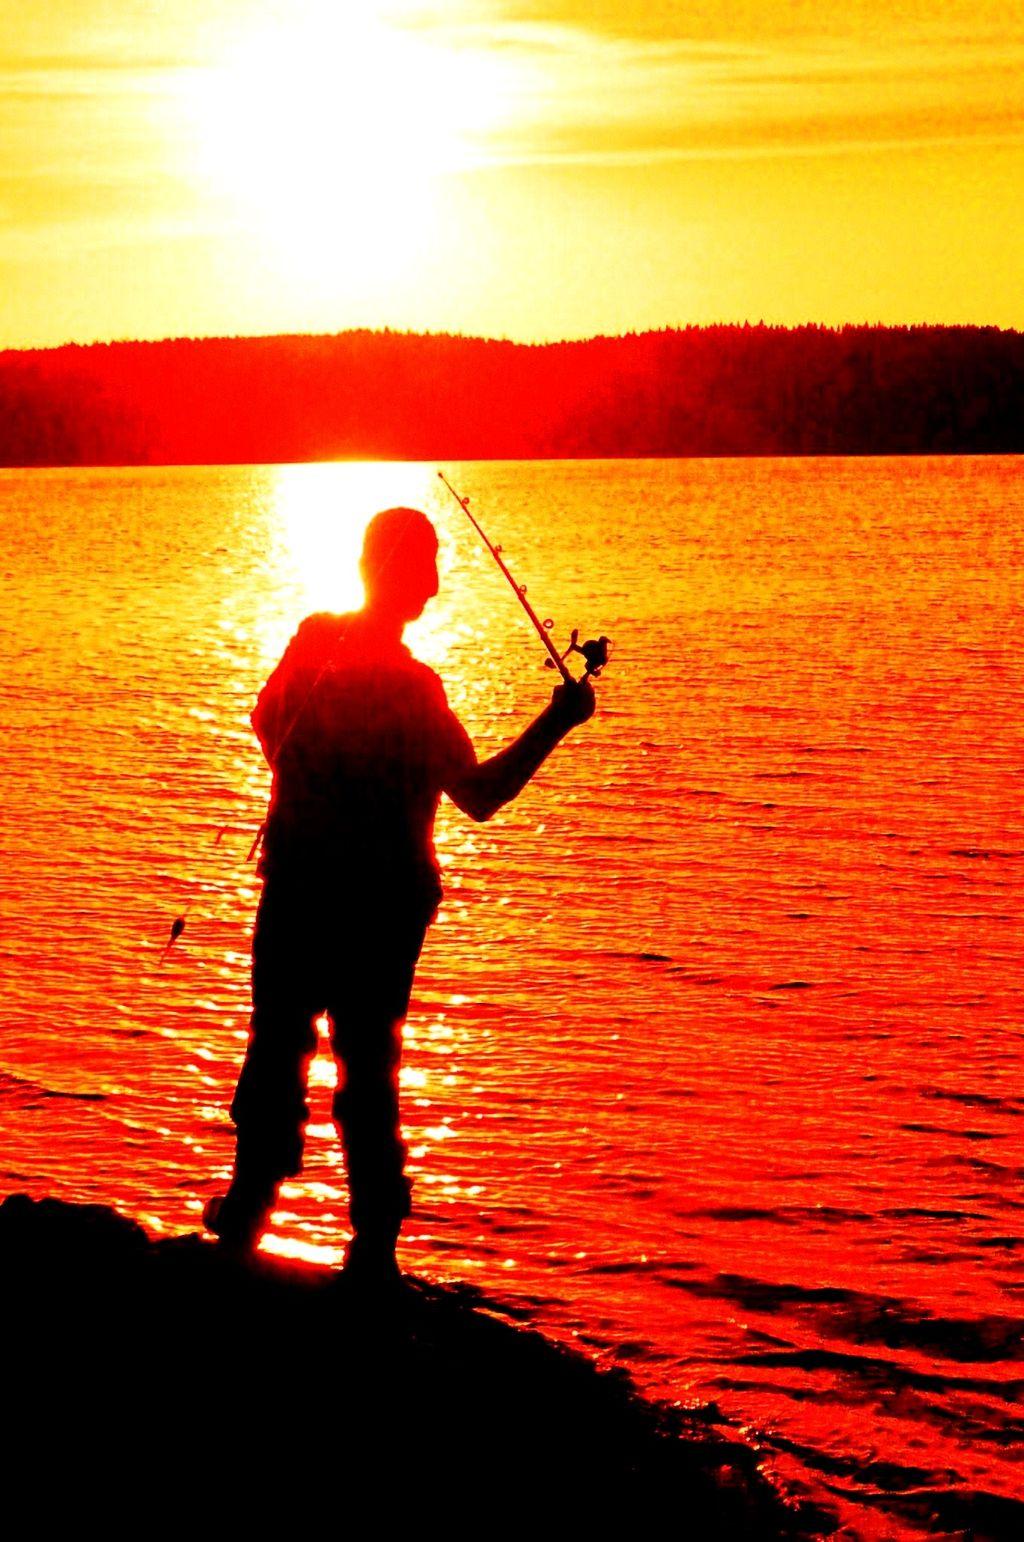 Название: рыбалка на закате.JPG Просмотров: 282  Размер: 253.8 Кб